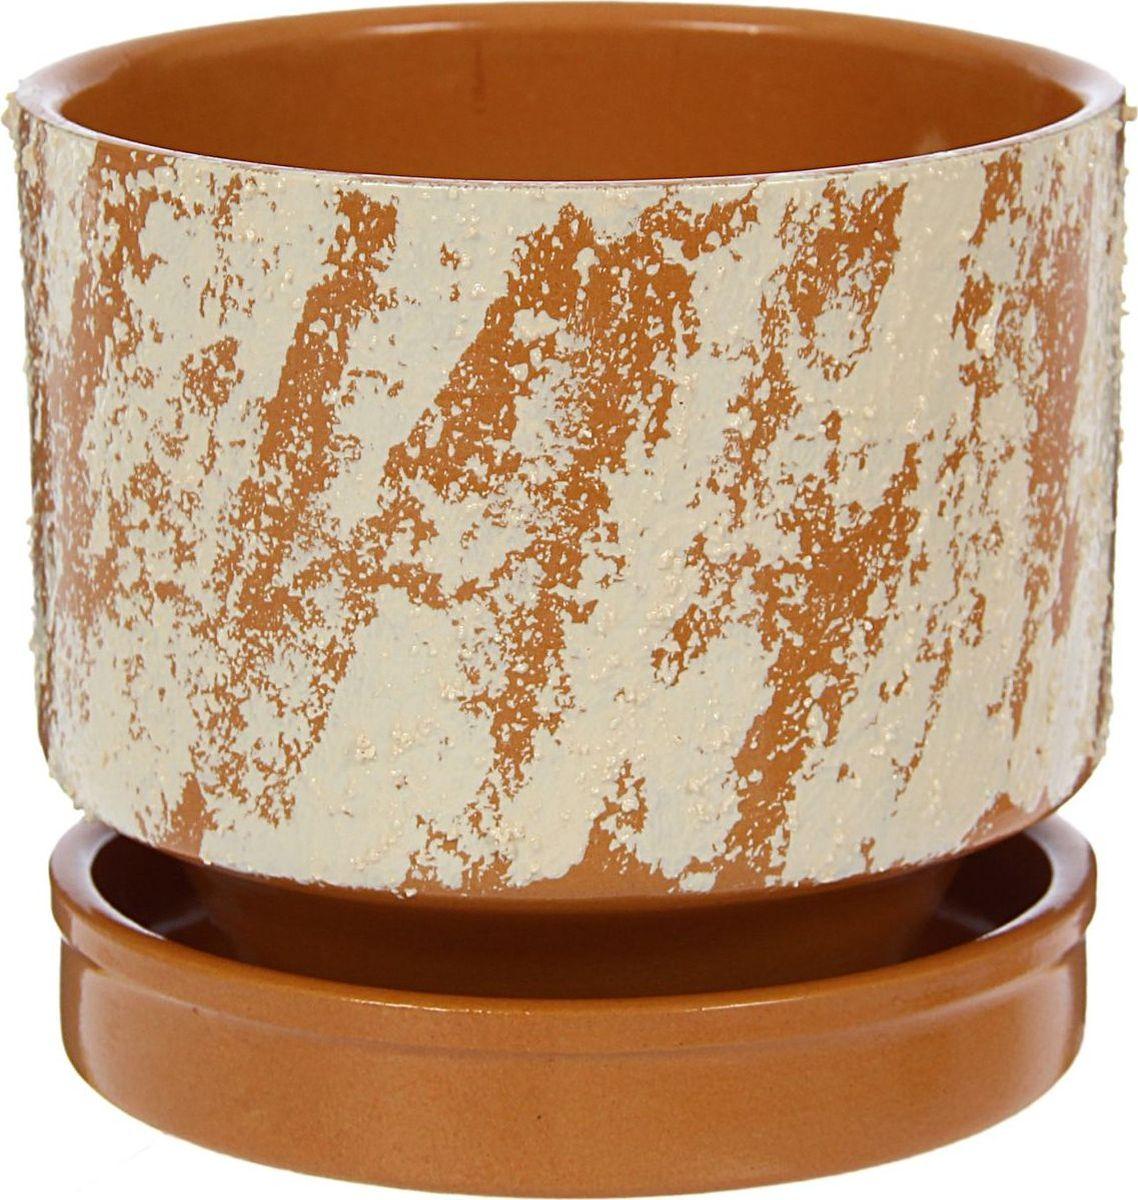 Кашпо Рельеф, цвет: коричневый, 13 х 13 х 12 см1422007